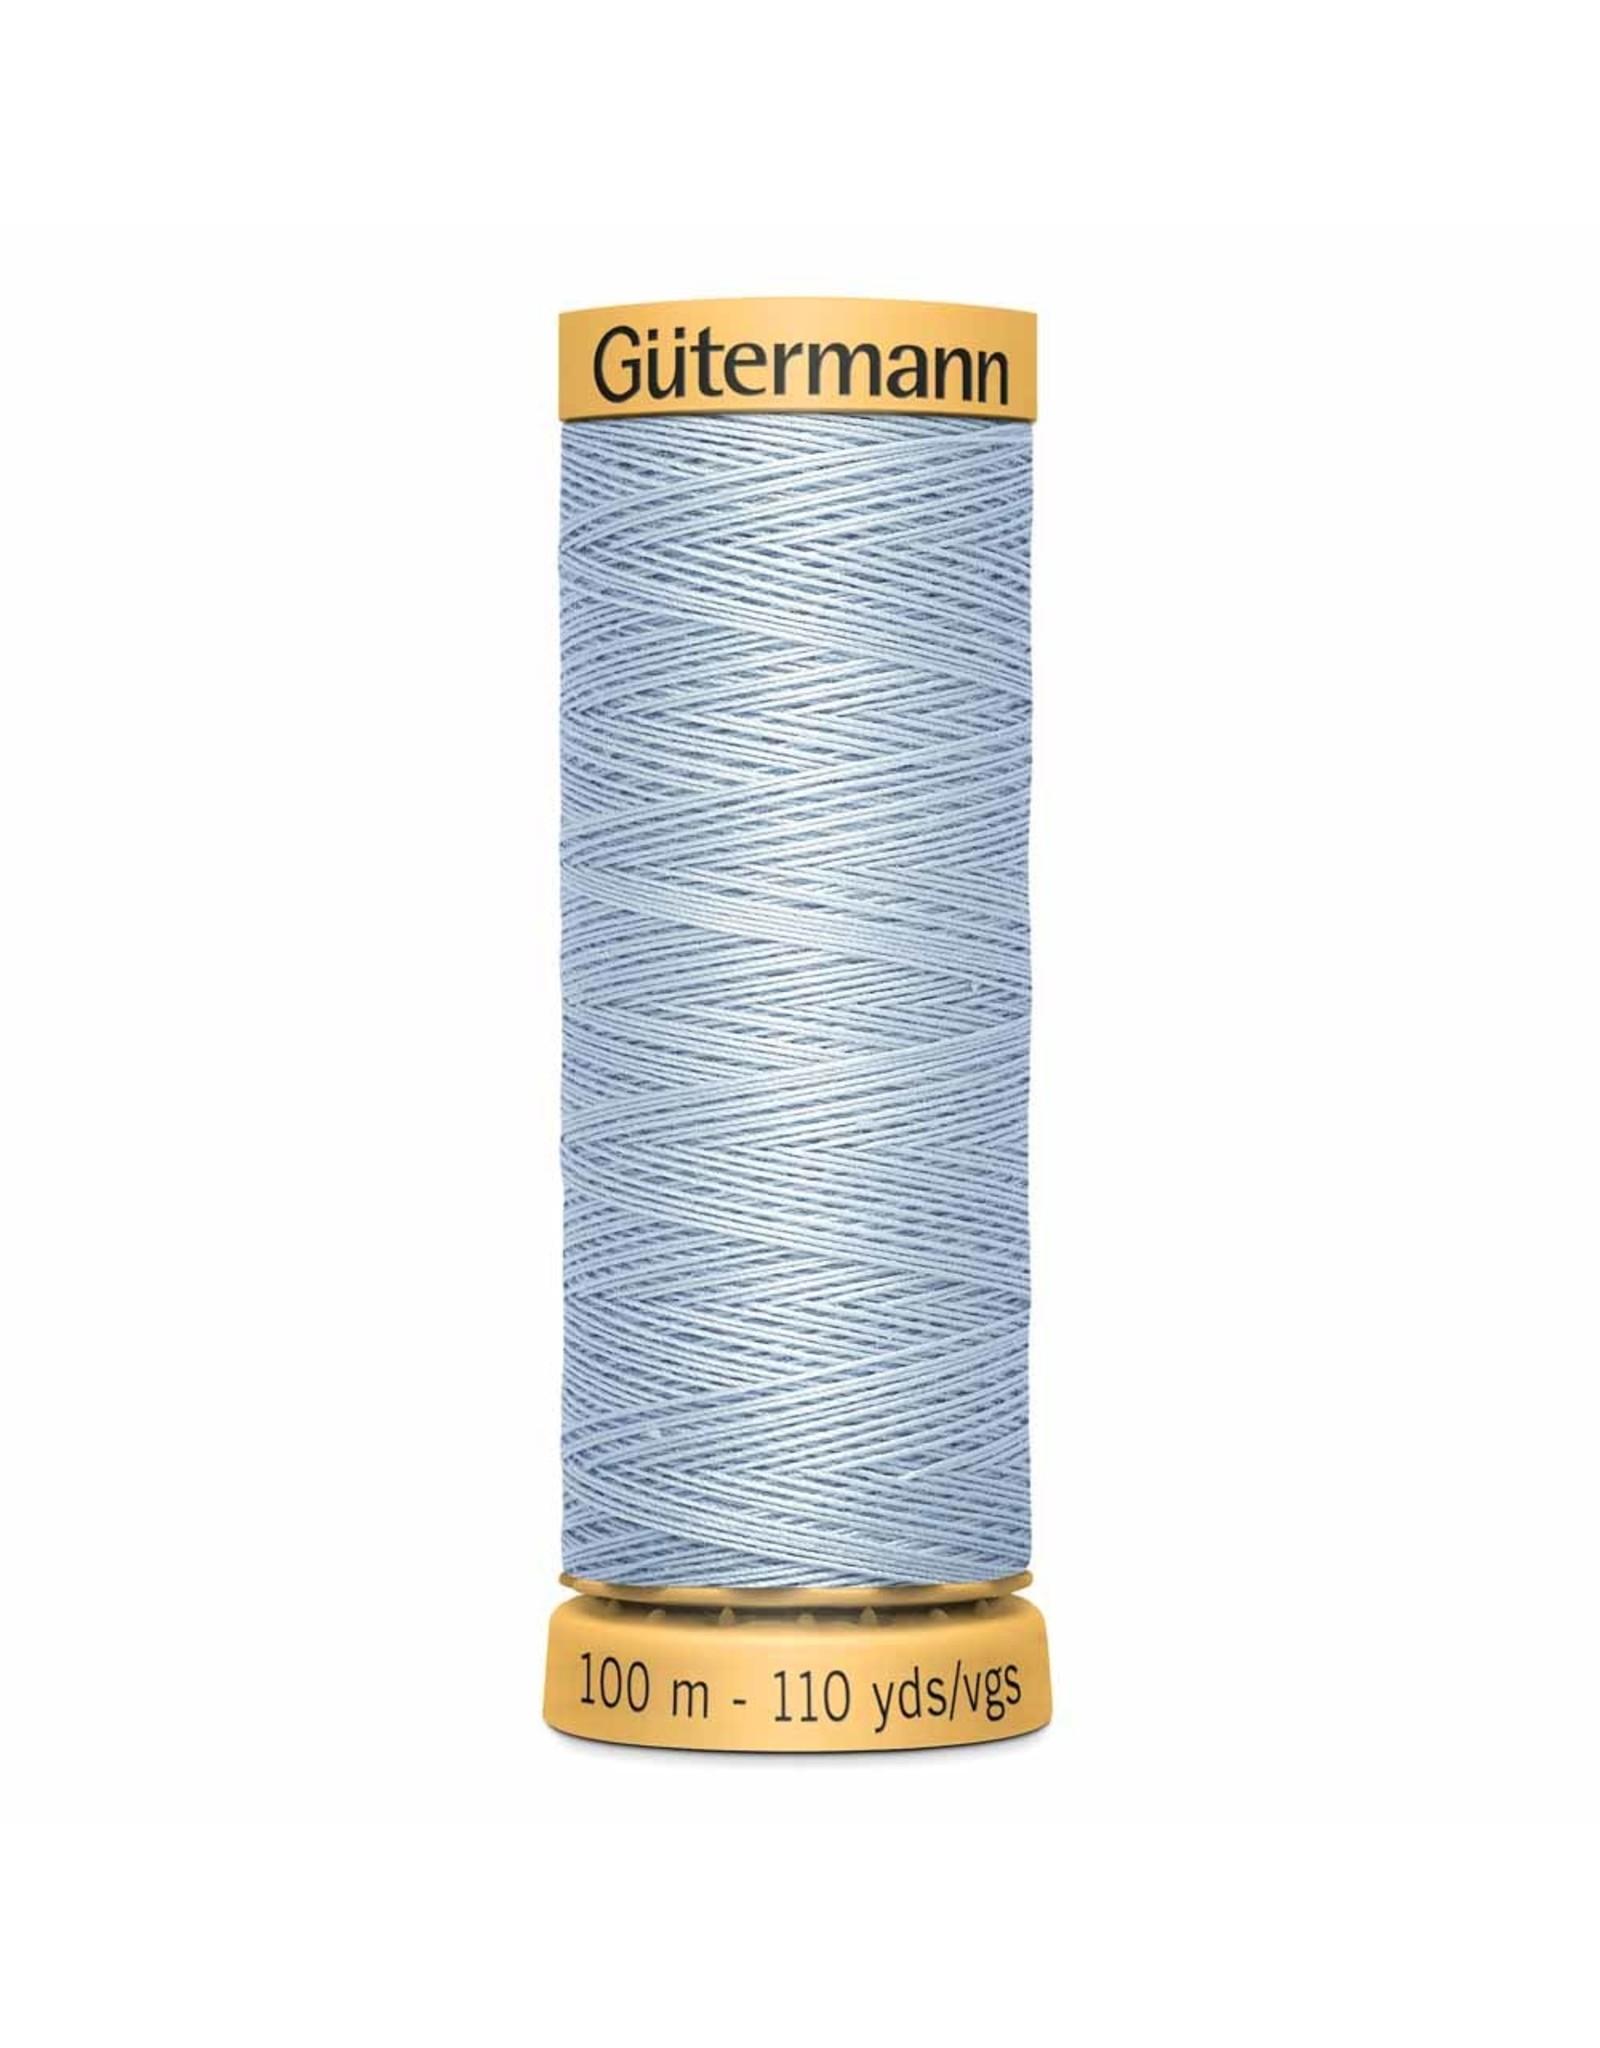 Gutermann Gutermann Bobbin - C Ne 50 Cotton